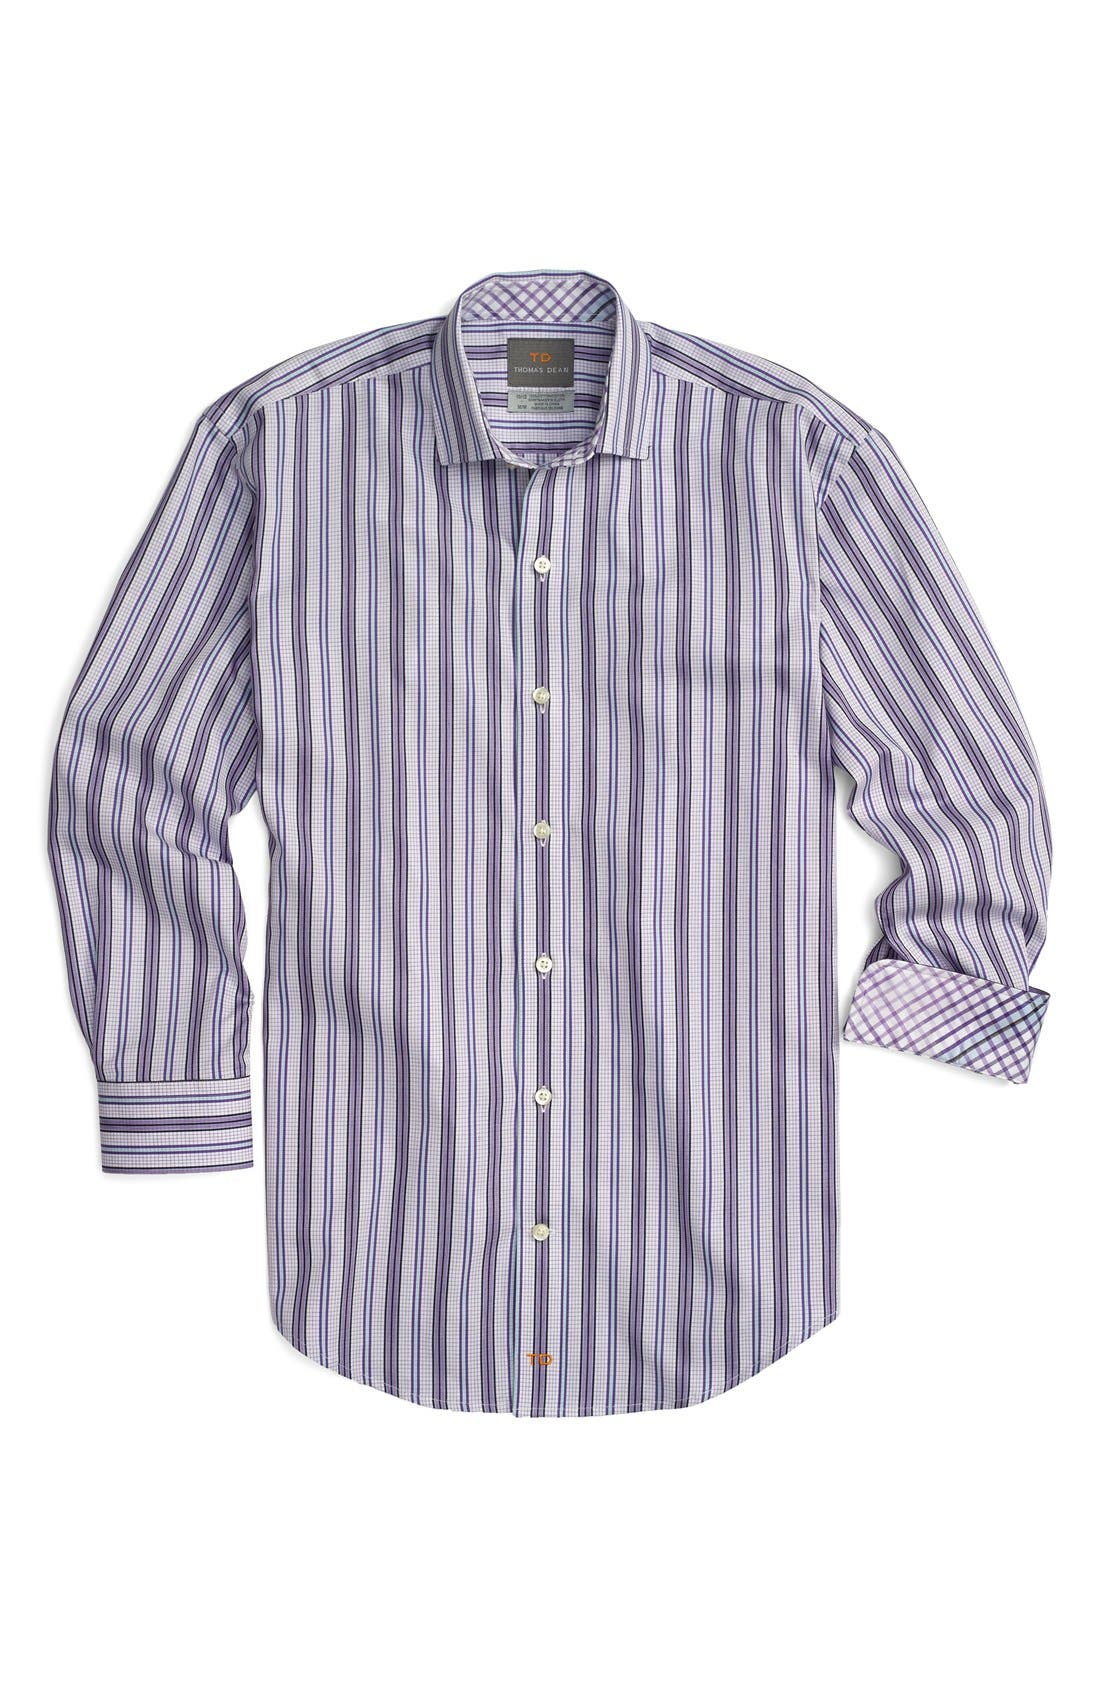 Alternate Image 1 Selected - Thomas Dean Stripe Cotton Poplin Dress Shirt (Little Boys)